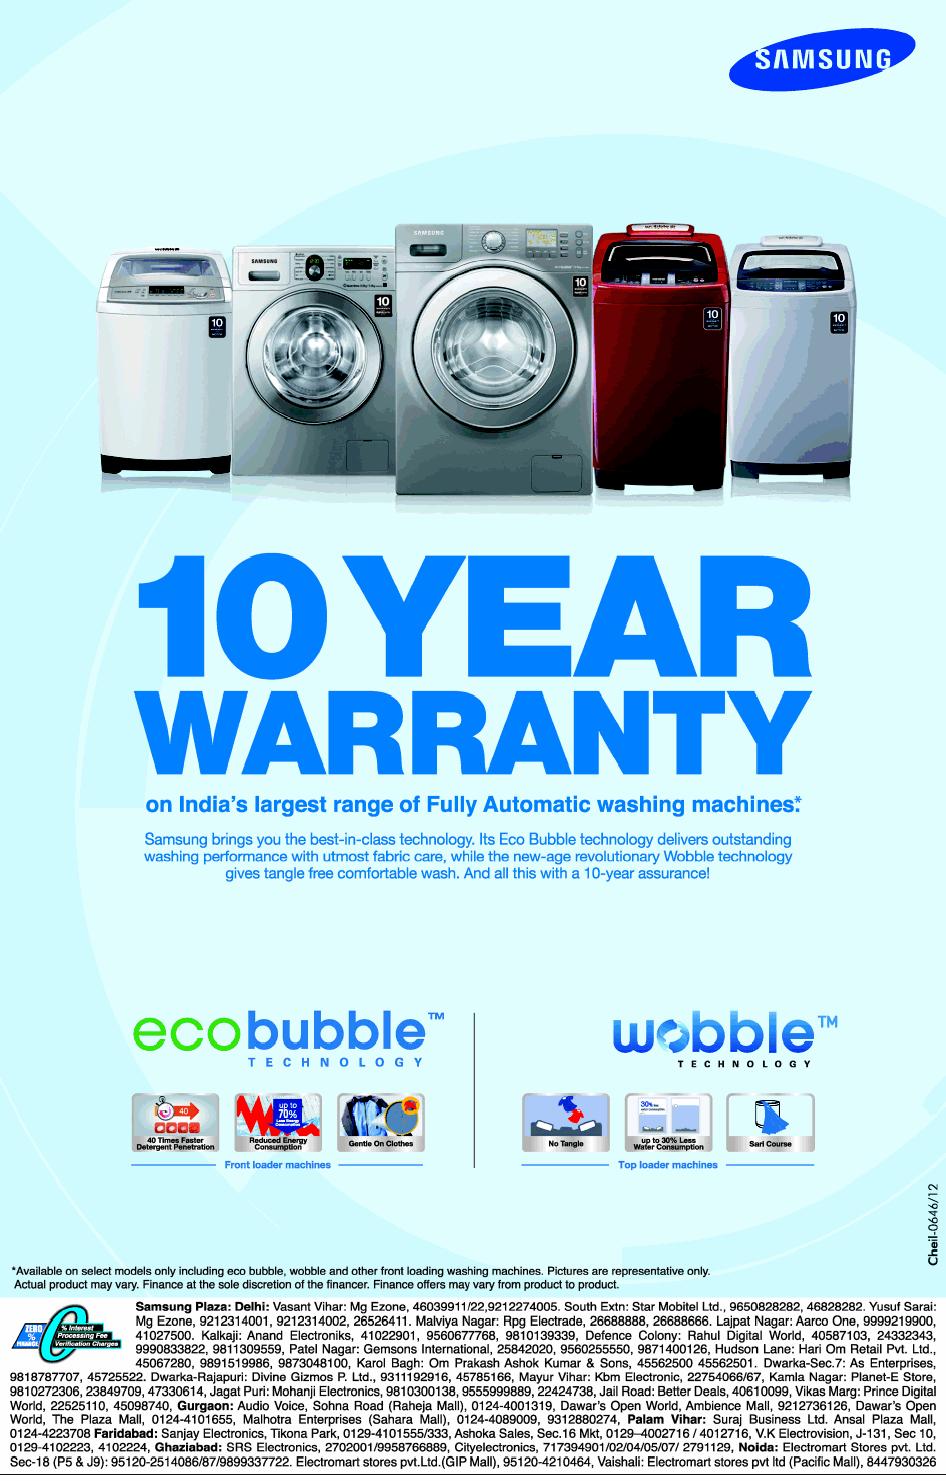 samsung warranty samsung washing machines 10 years warranty mumbai new delhi bangalore saleraja